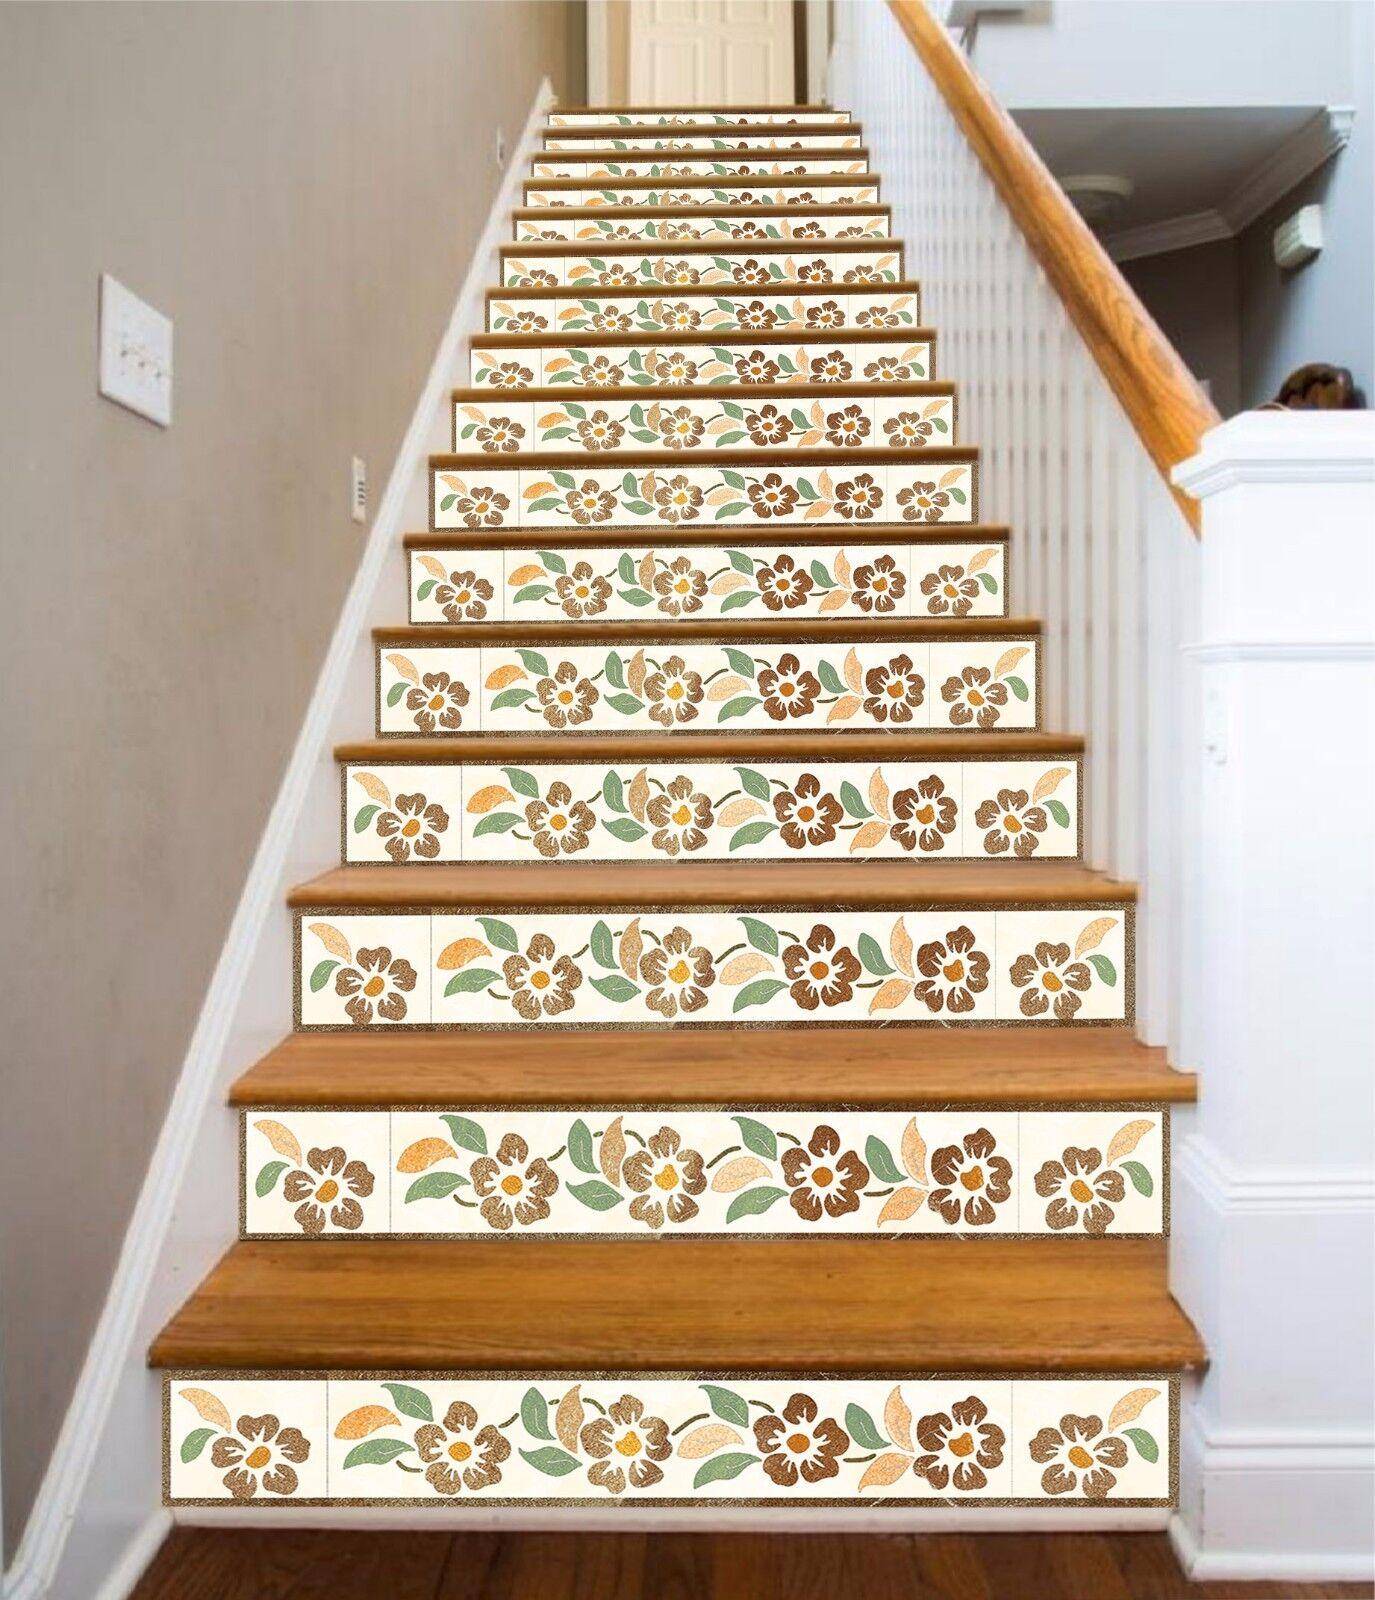 3D Flowers 61 Stair Risers Decoration Photo Mural Vinyl Decal Wallpaper AU Lemon